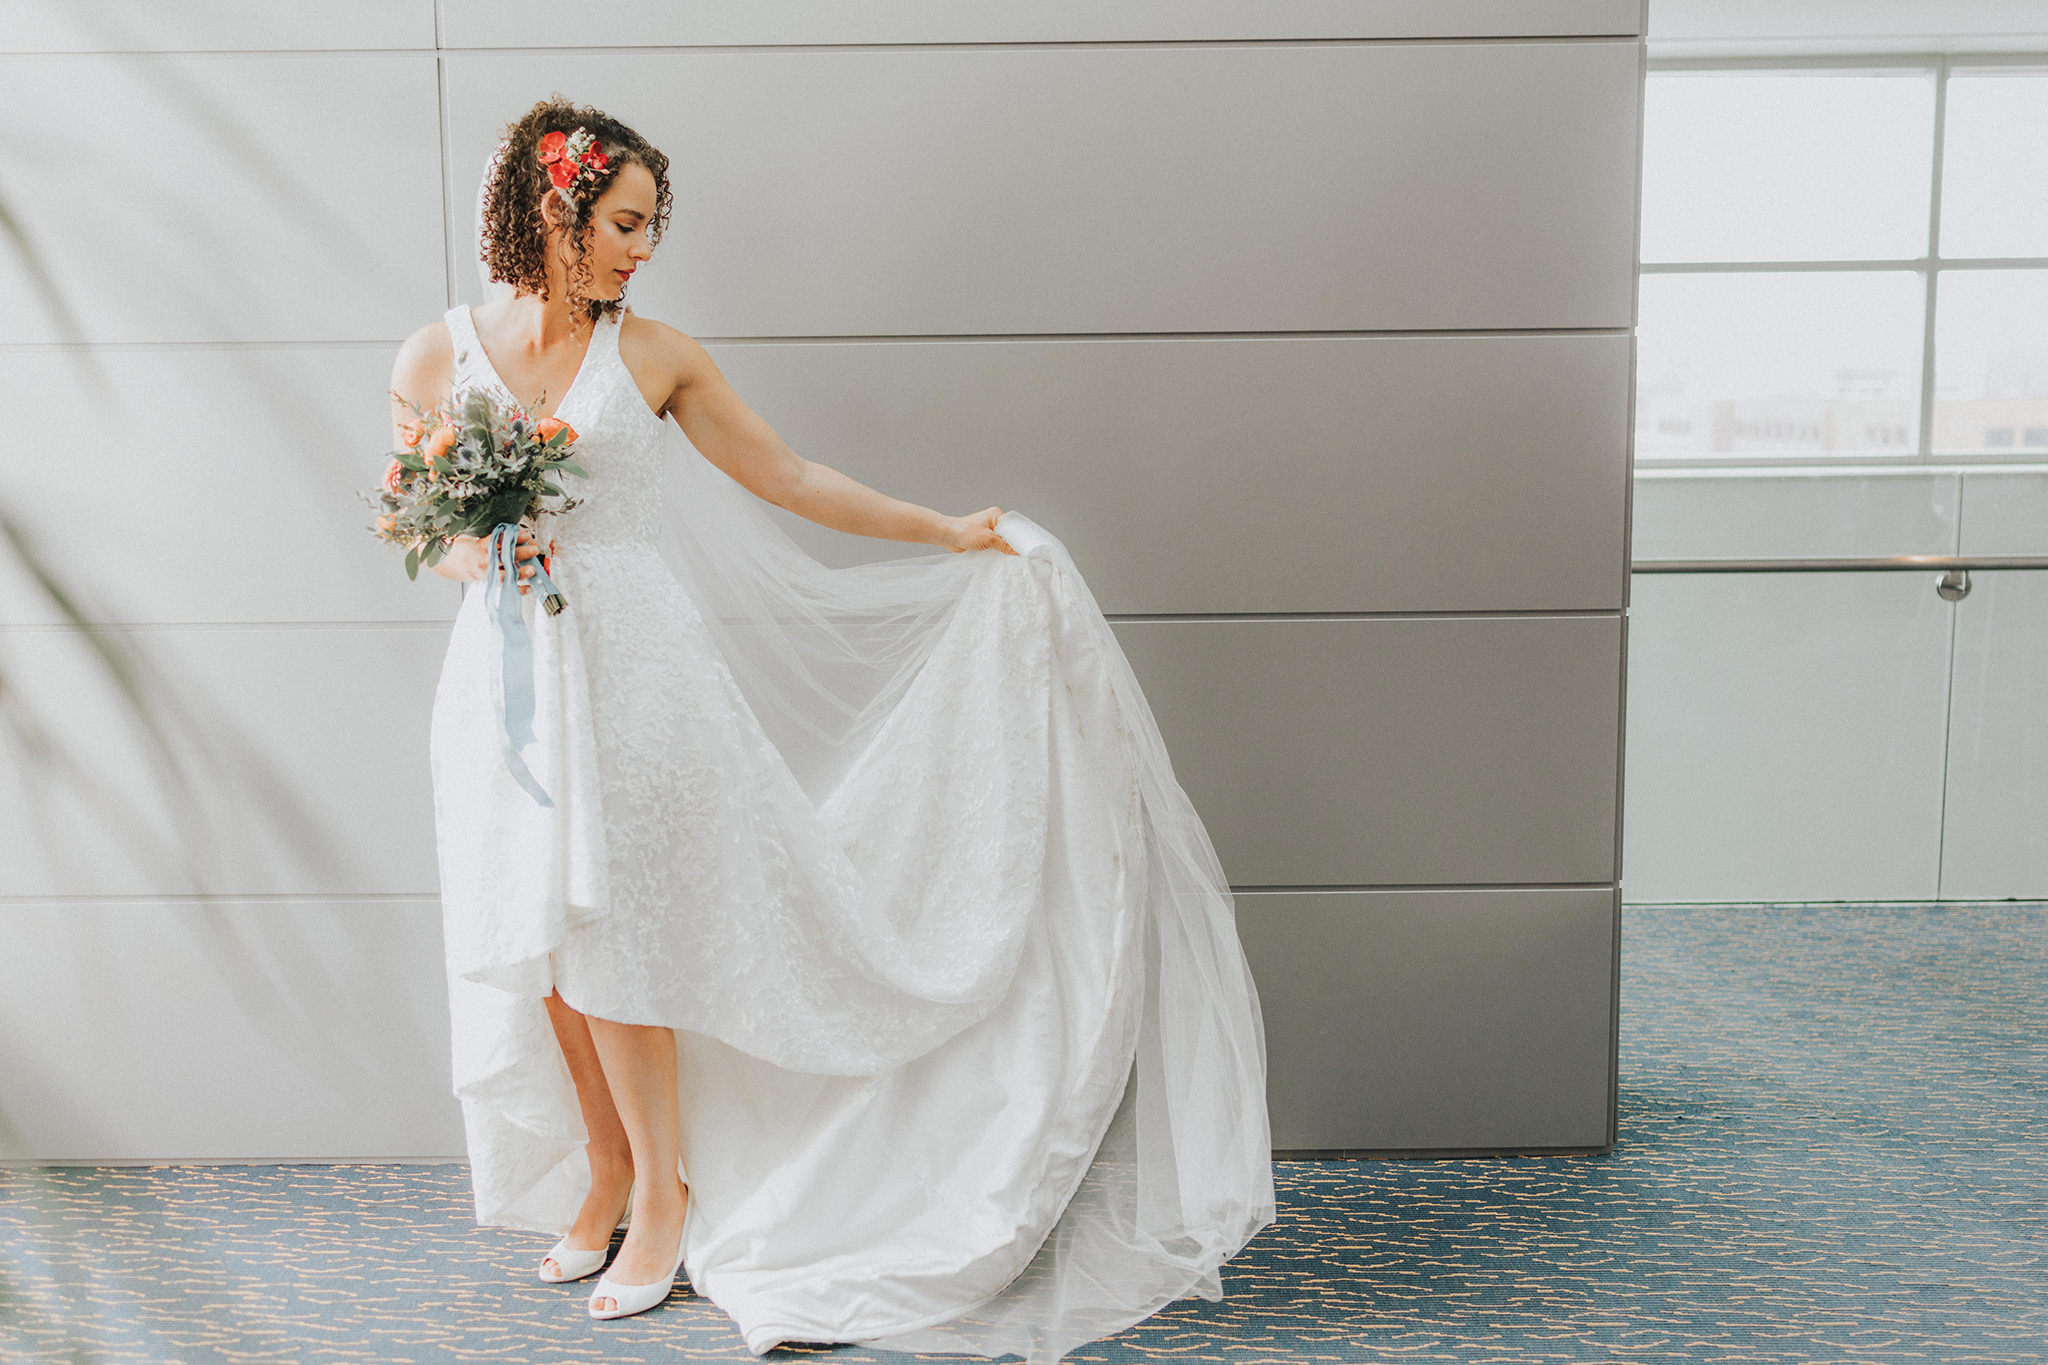 154 omaha-wedding-photographer-planner-tiny-luxe-velvet-sage.jpg